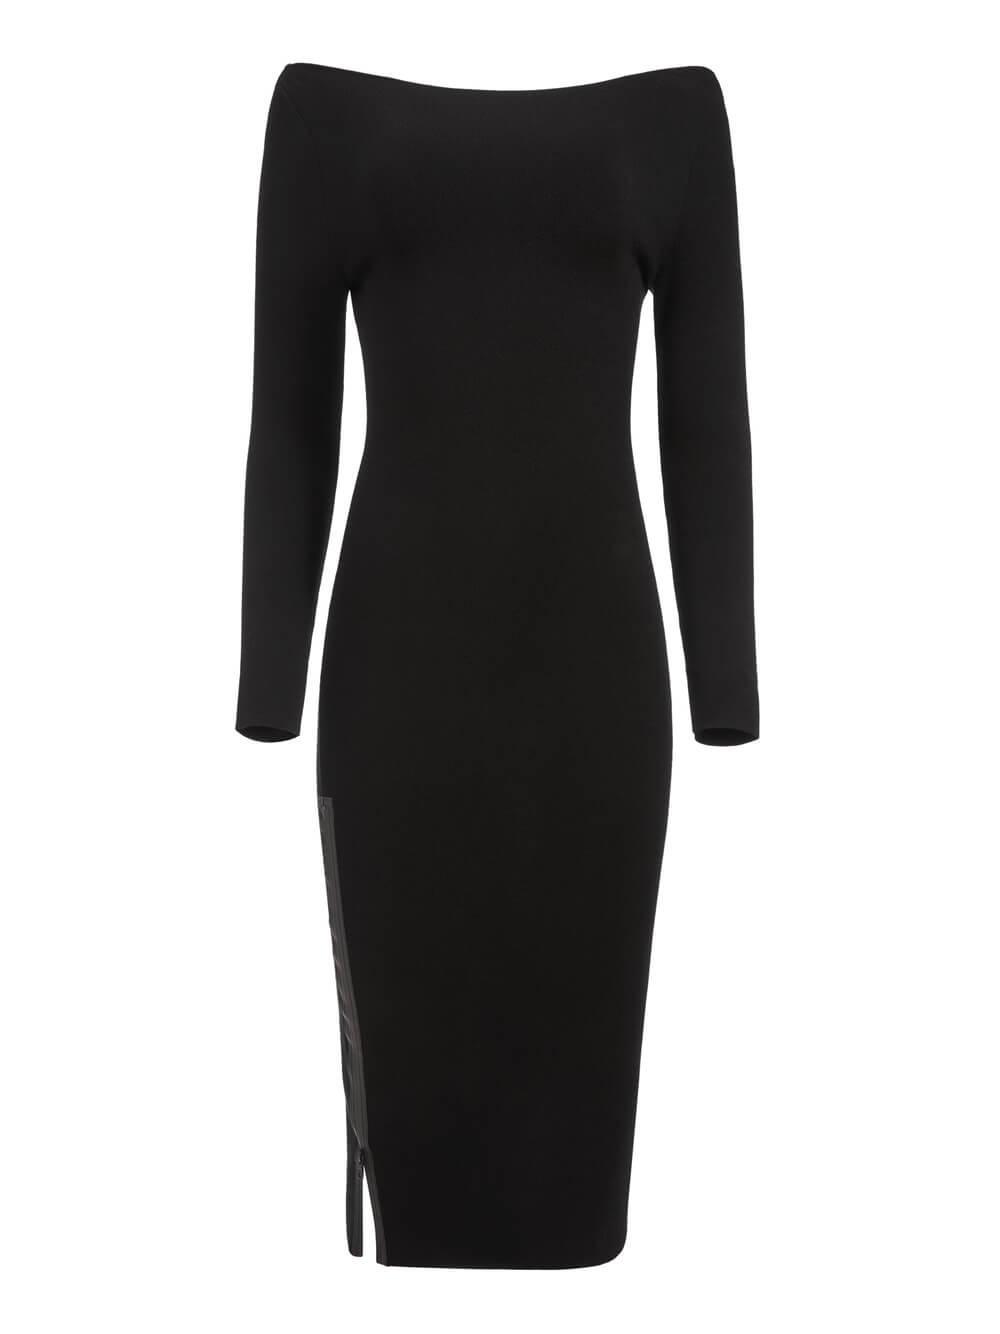 Rochelle Boatneck Midi Dress Item # CL000526702